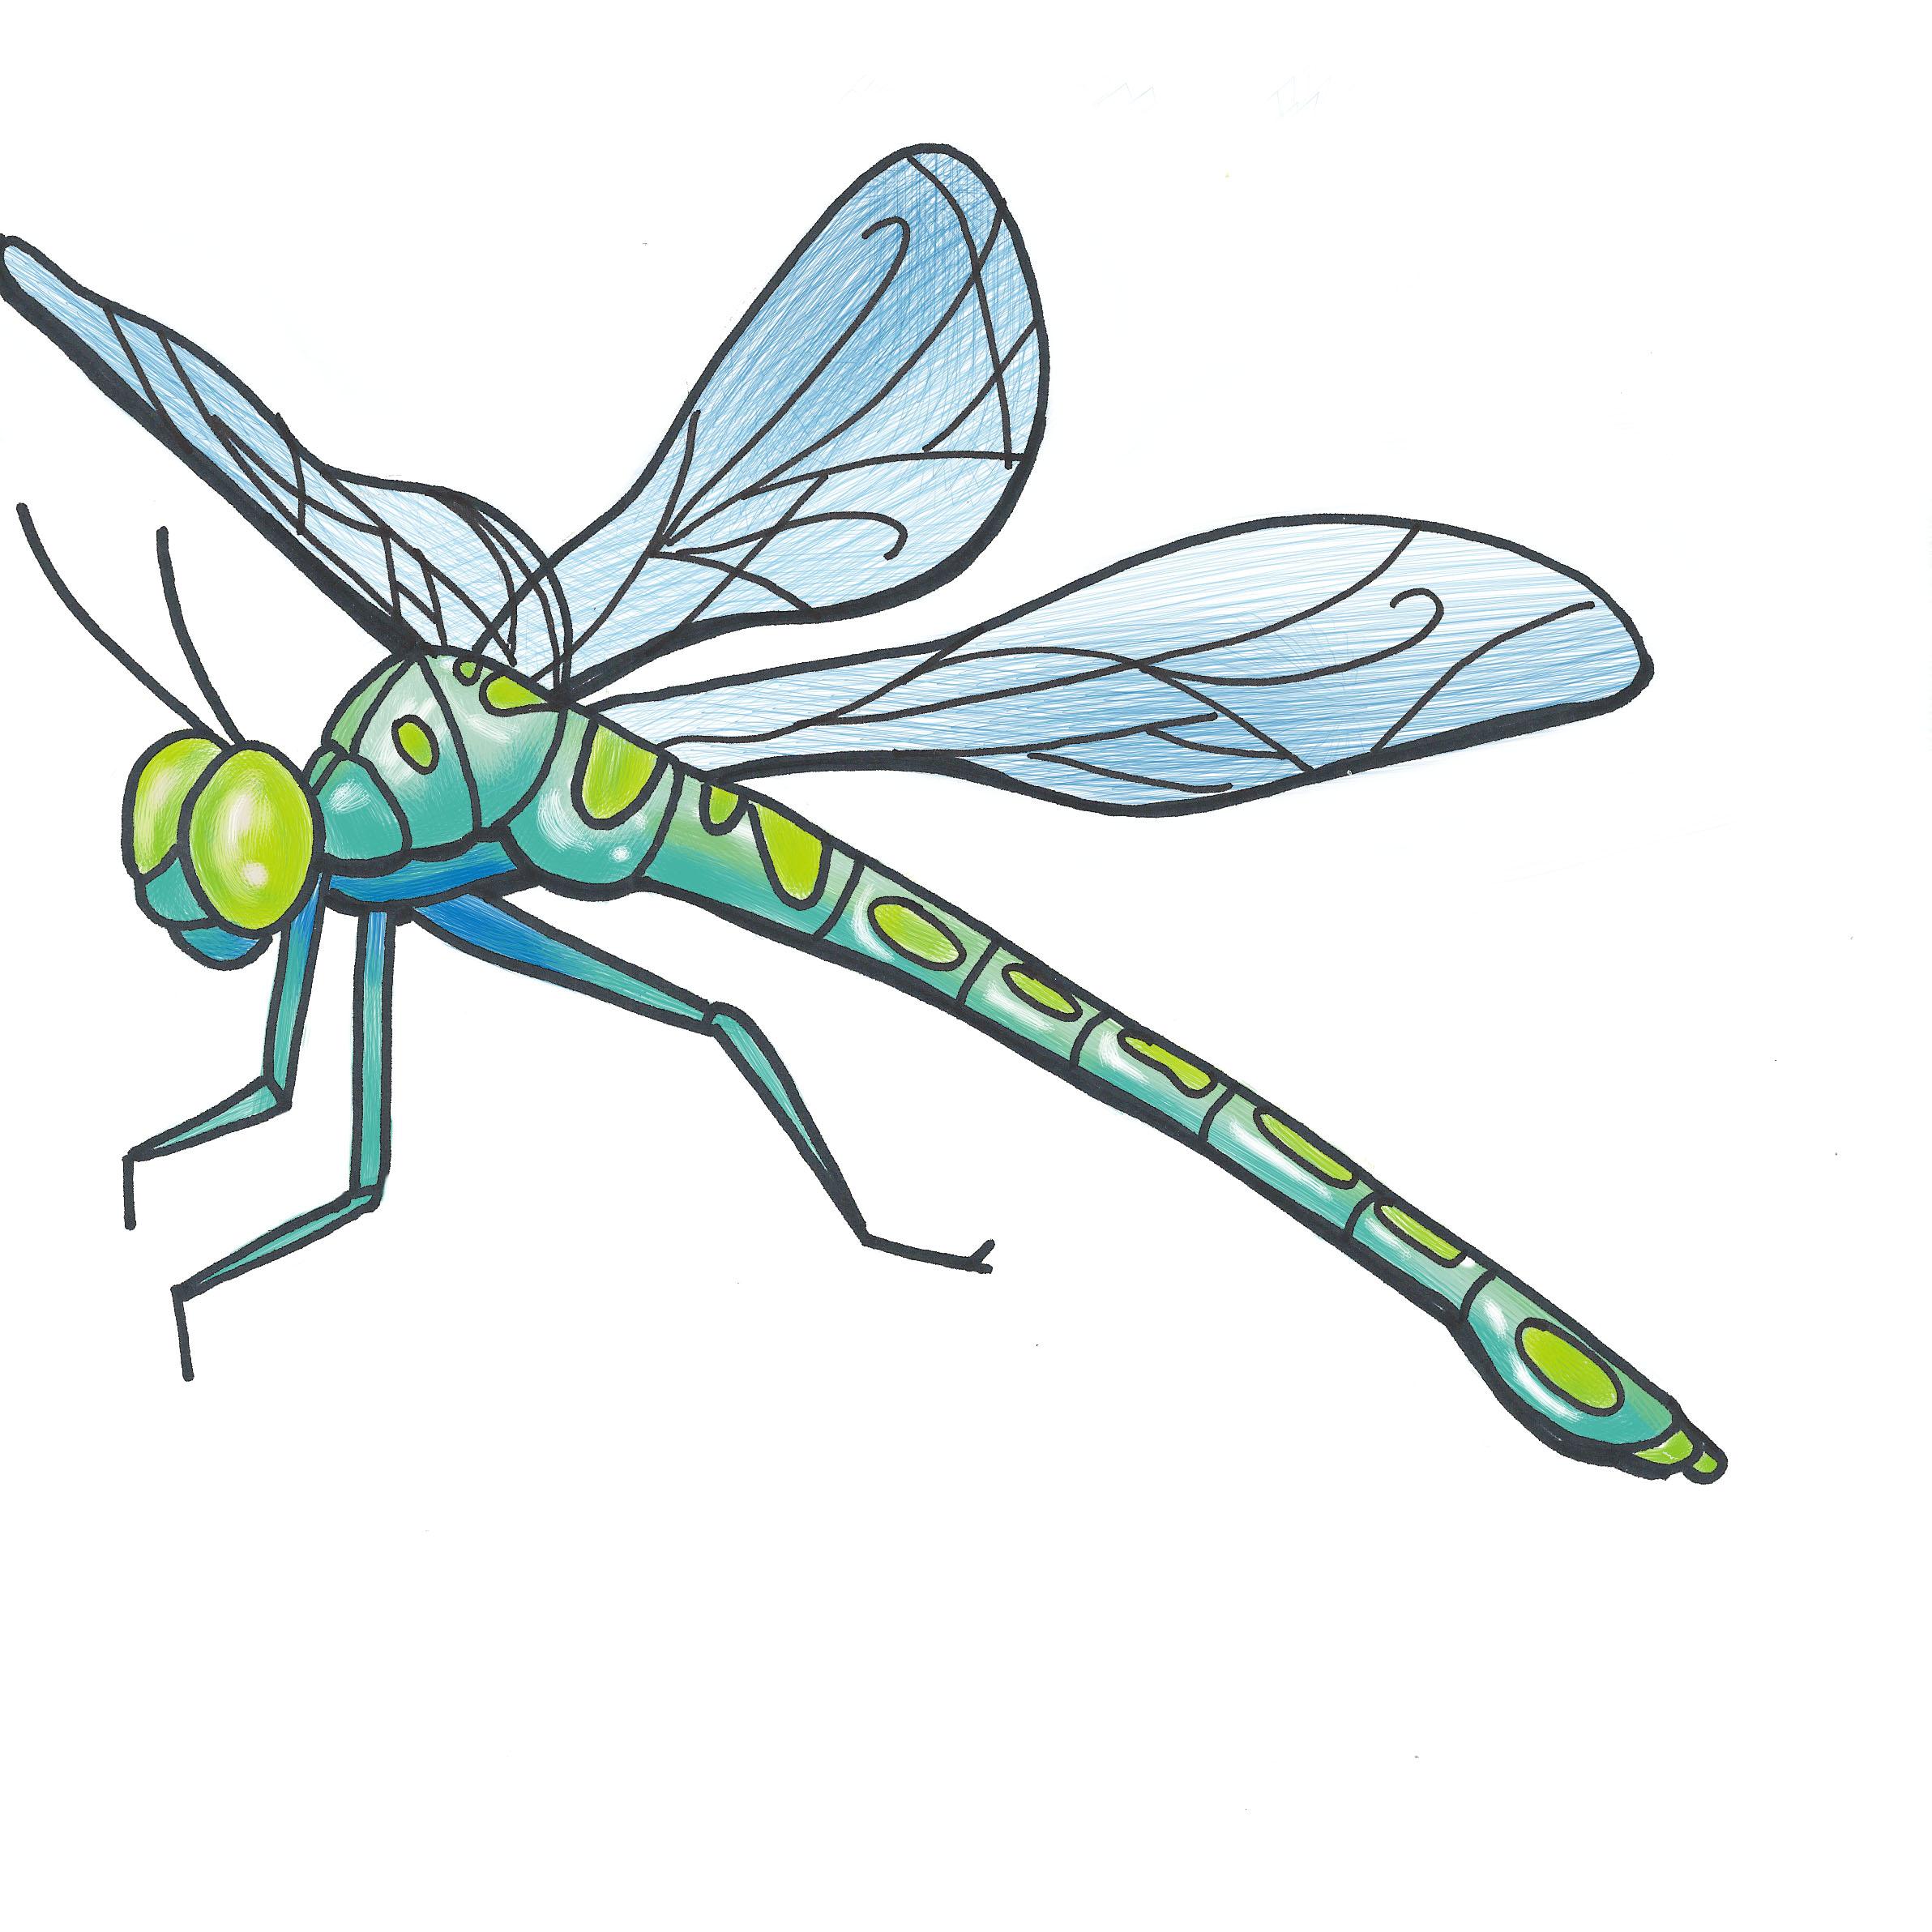 - dragonfly illustration 2 -